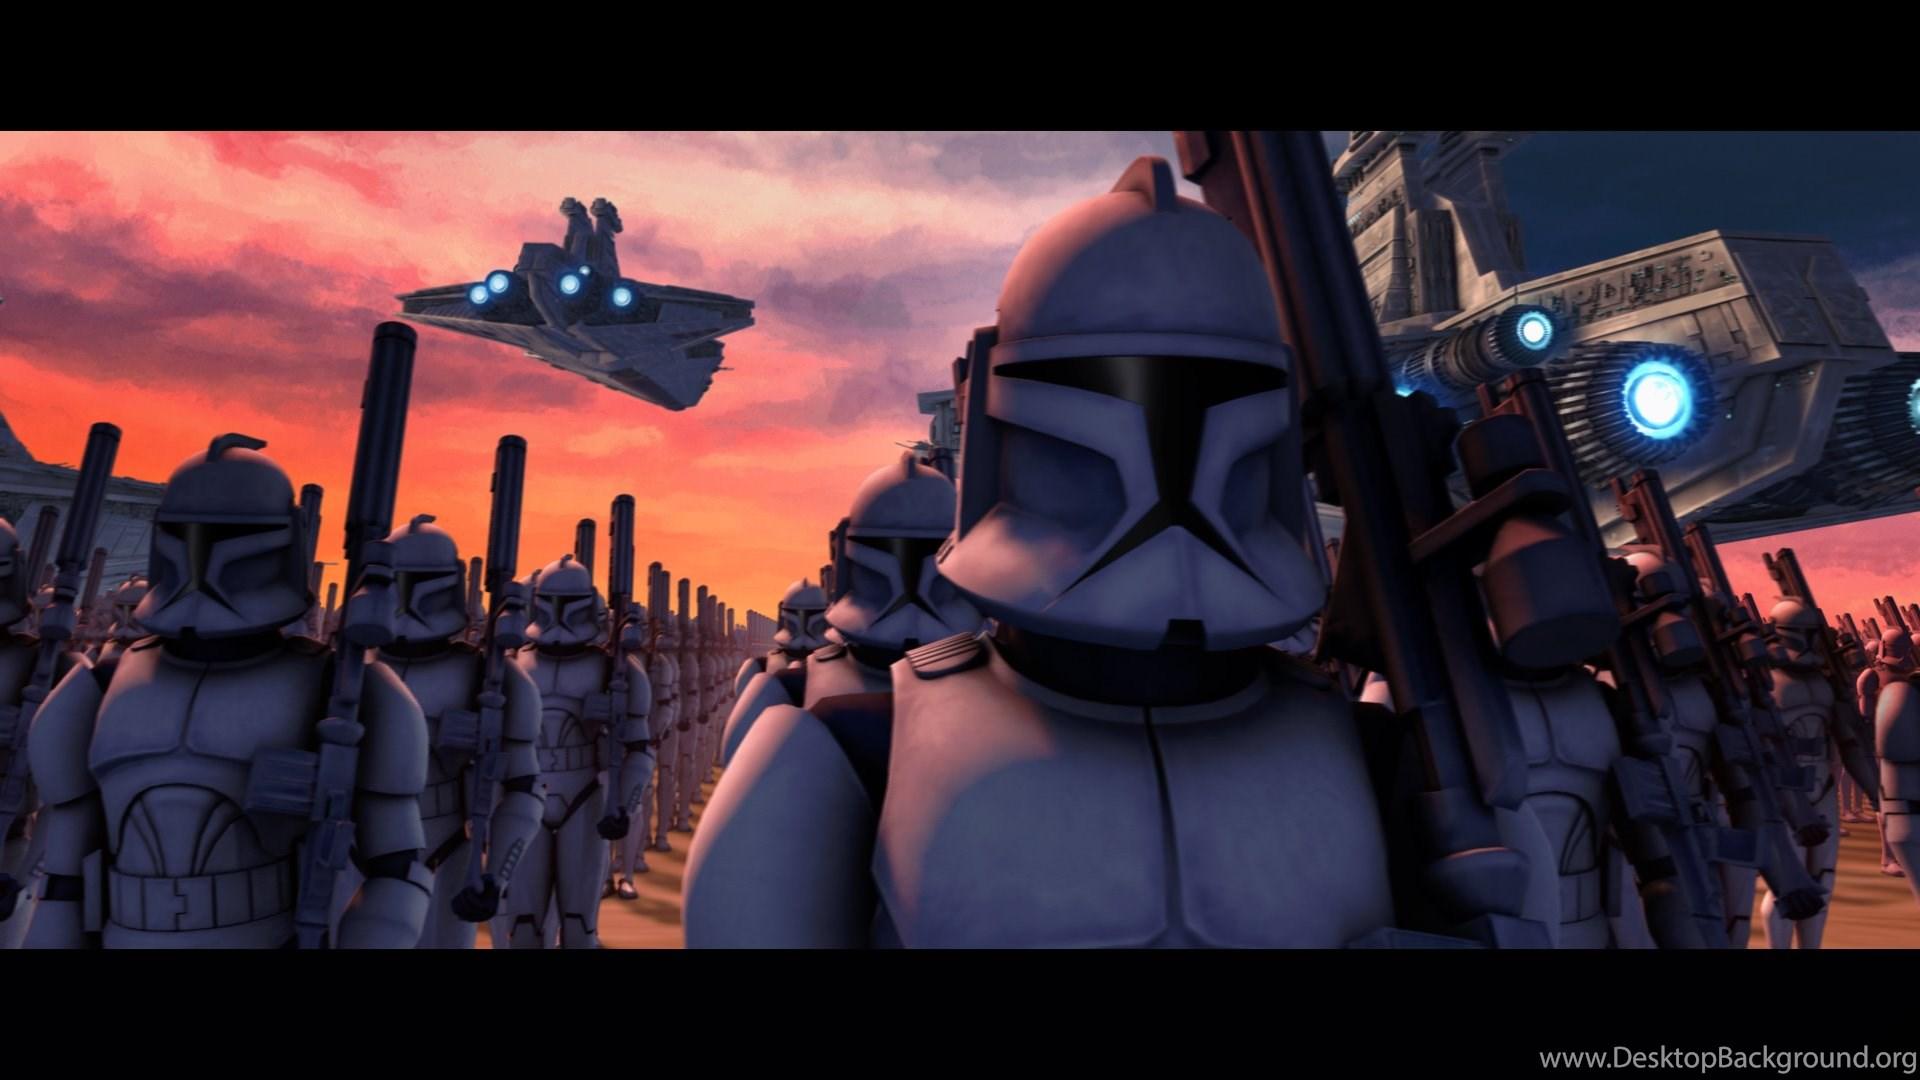 Star Wars Clone Trooper Phase 2 Wallpapers Desktop Background